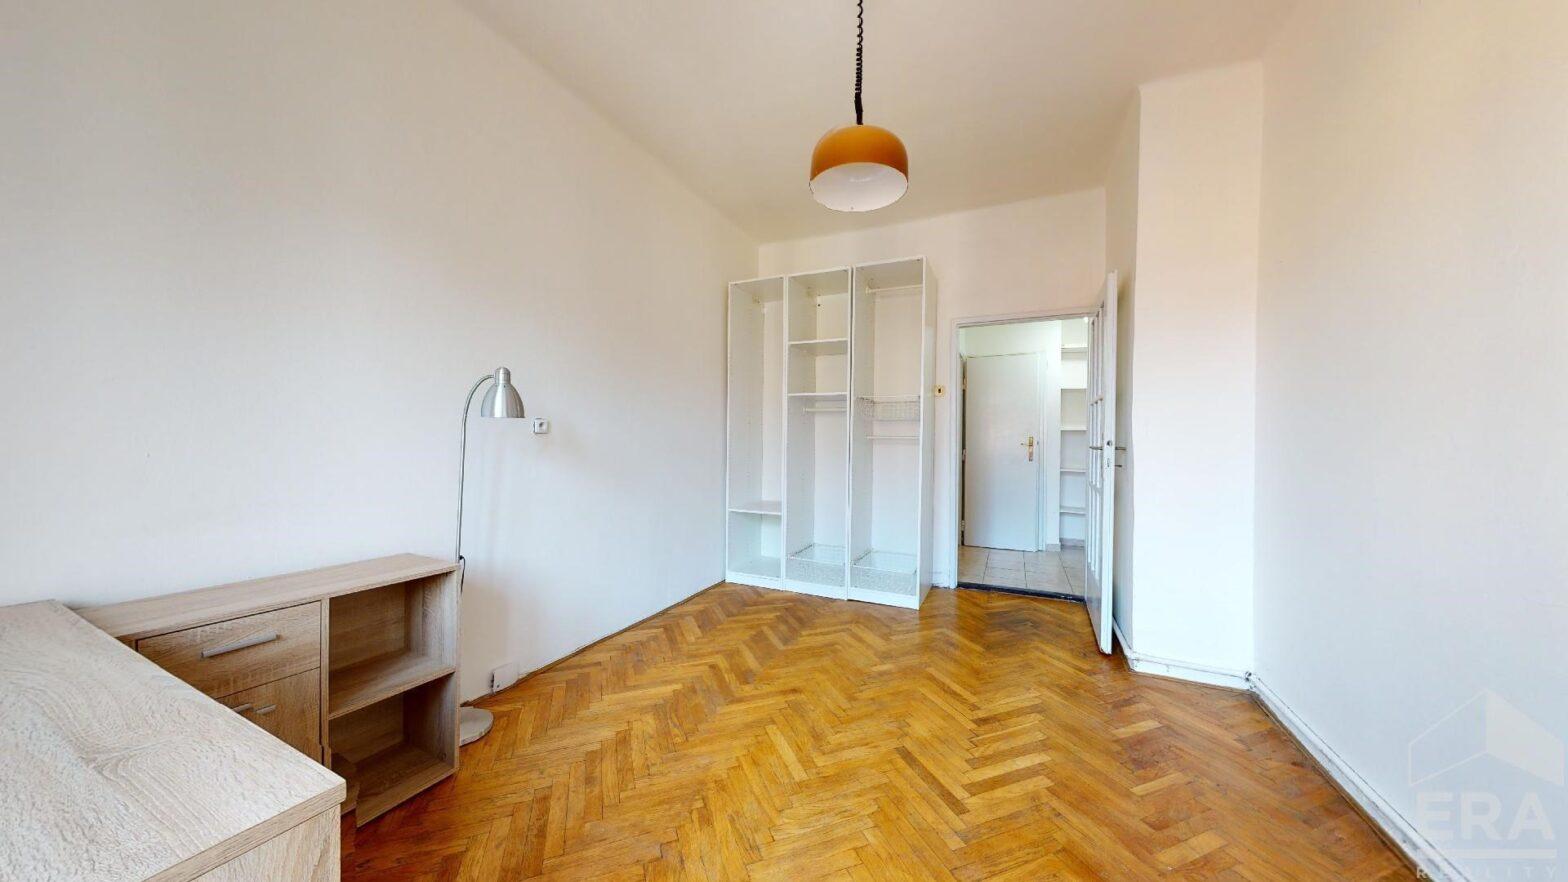 Pronájem bytu 2+kk, 32 m2, ul. Sinkulova 8, Praha – Podolí